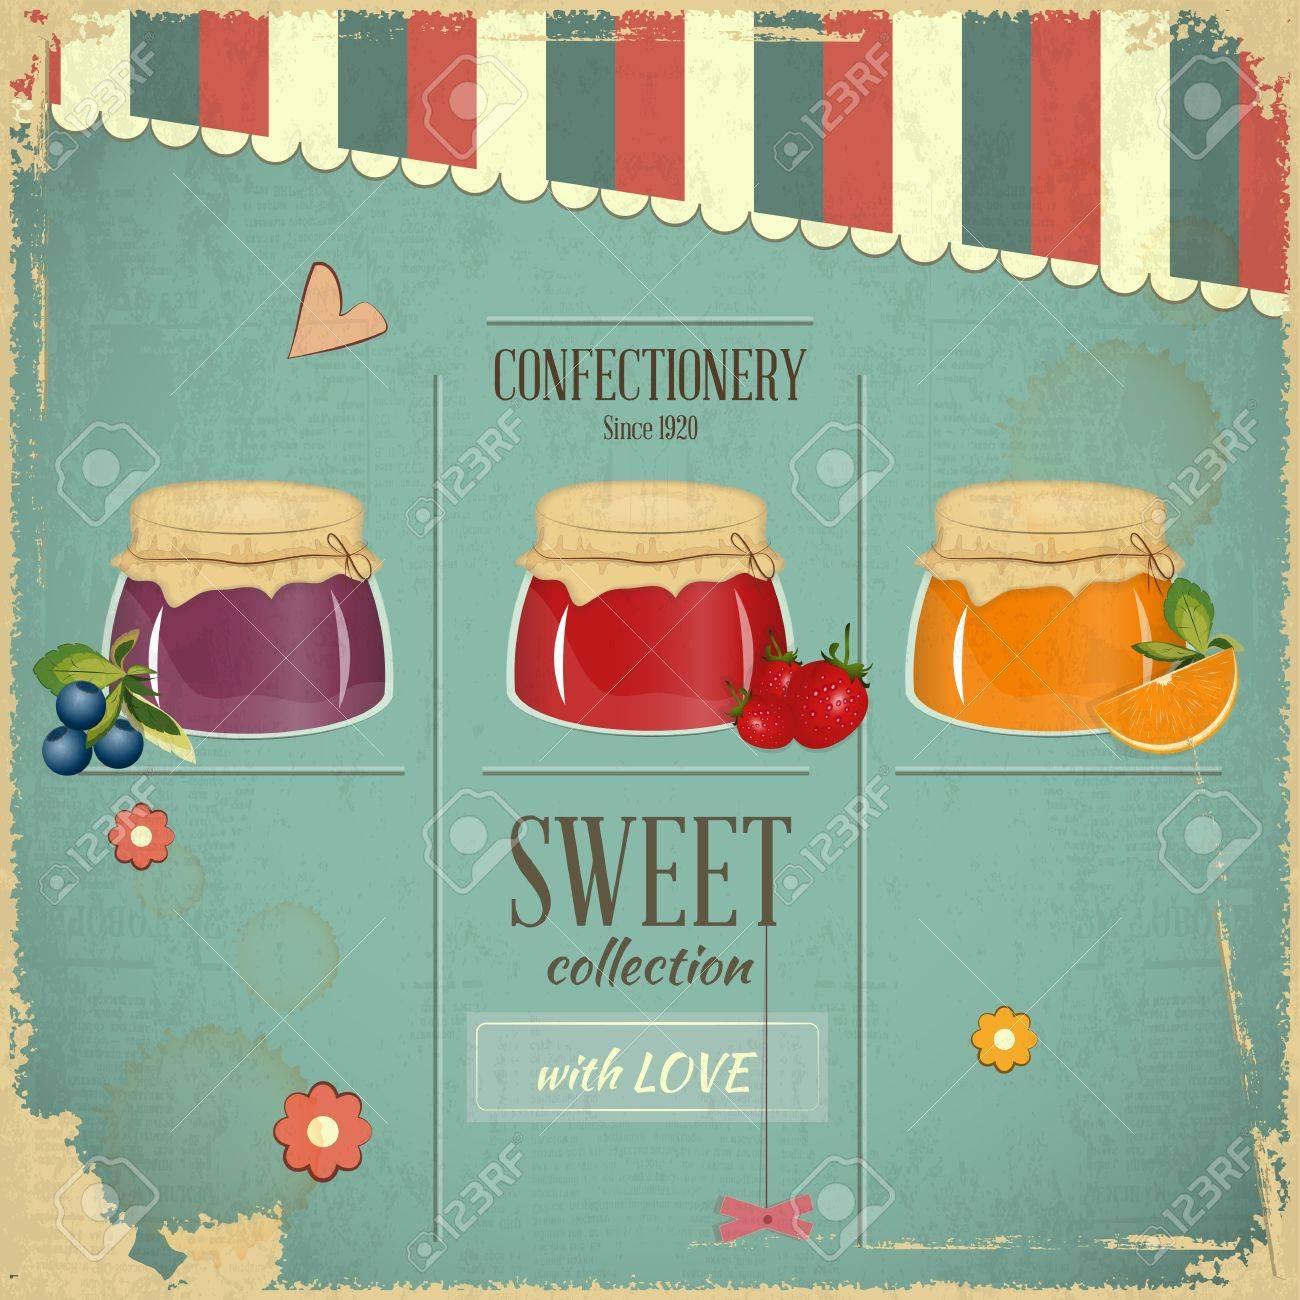 Confectionery Menu Card In Retro Style - Jam Marmalade Dessert ...